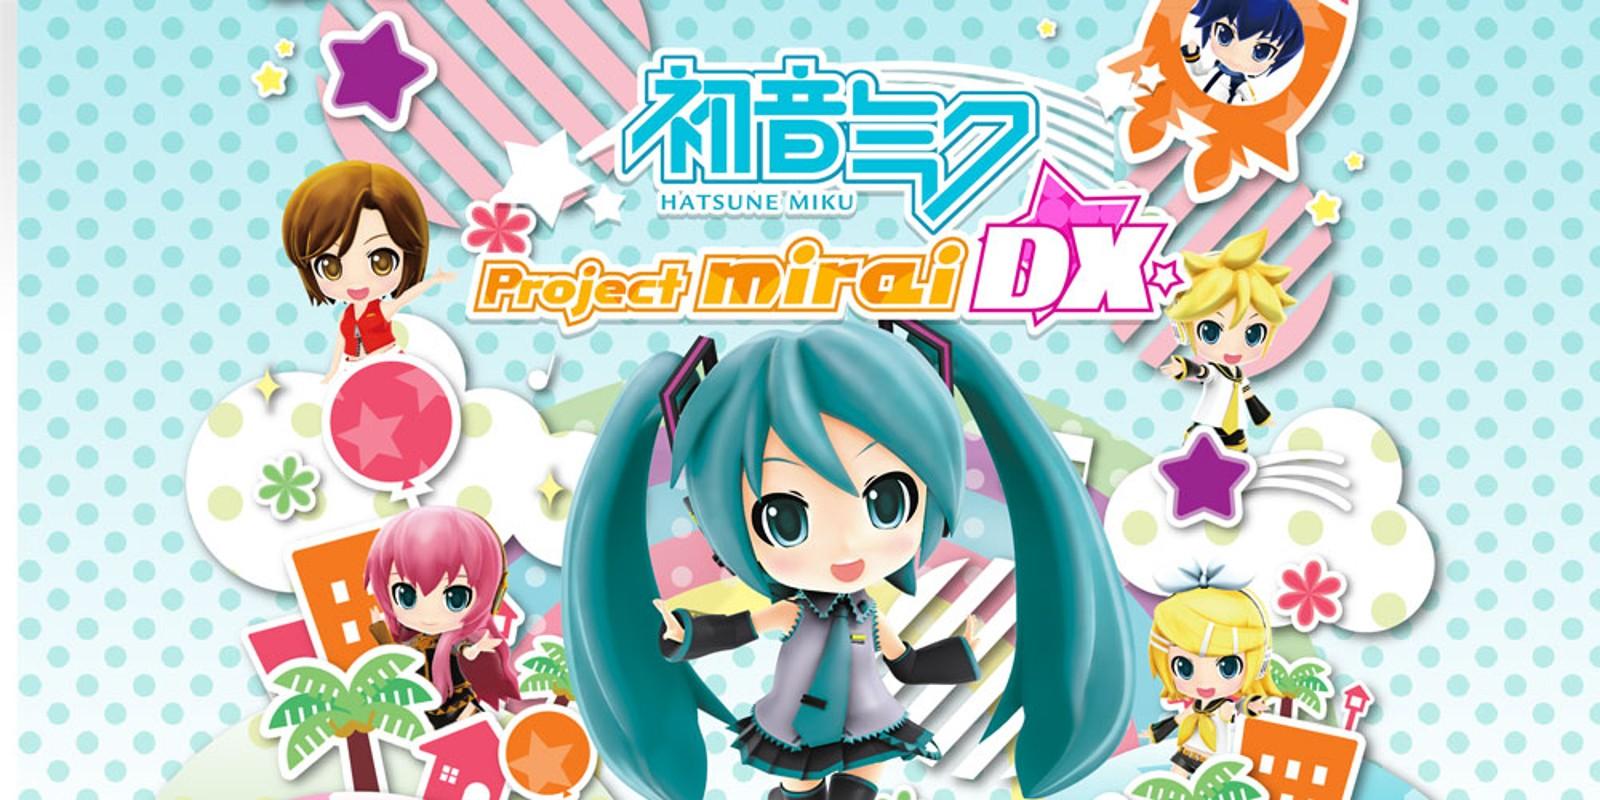 Hatsune Miku Project Mirai Dx Nintendo 3ds Juegos Nintendo